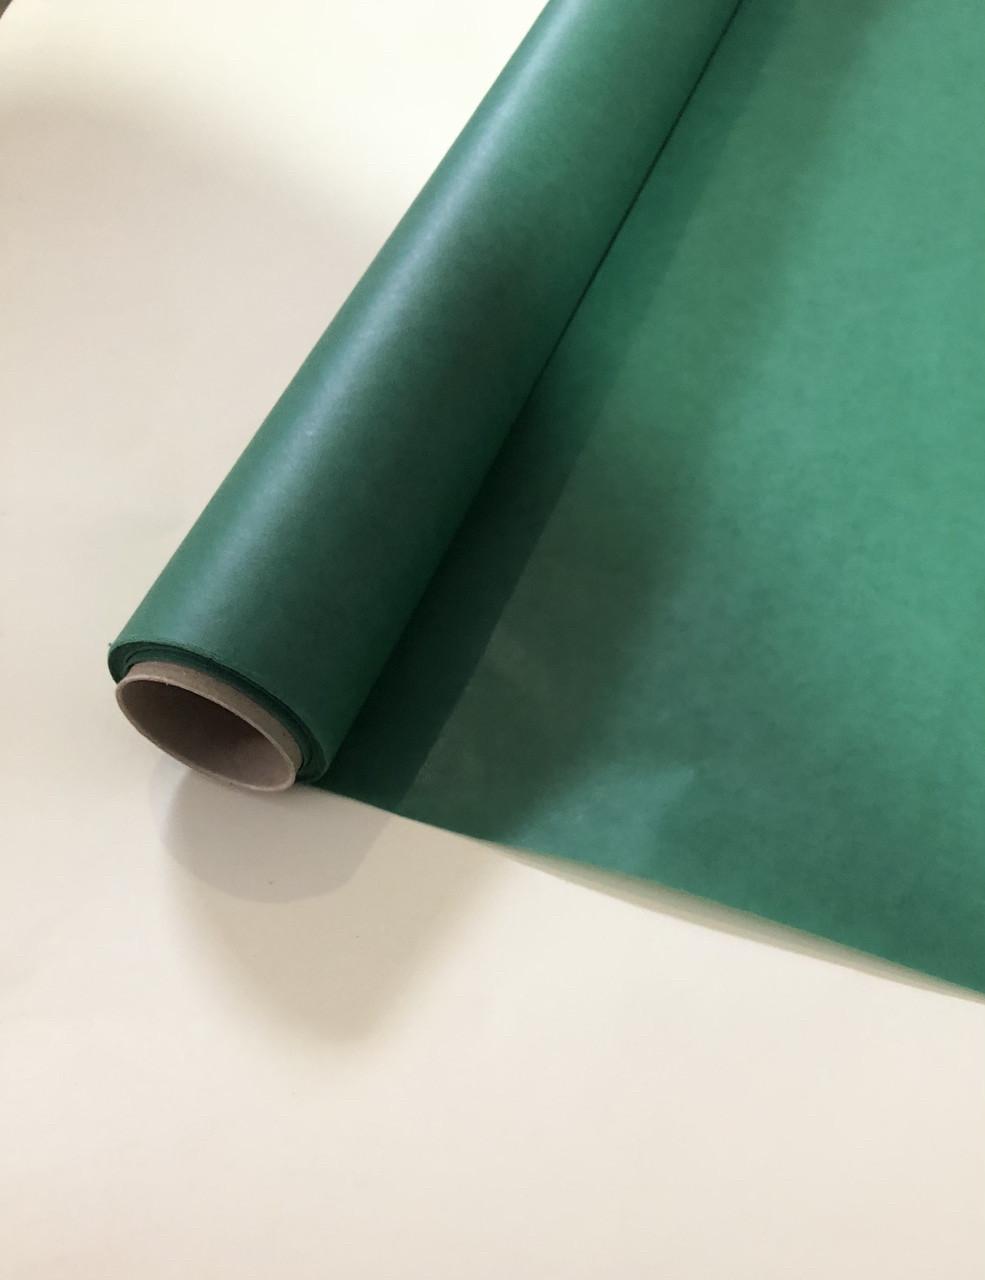 Бумага тишью в рулоне плотная  зеленая